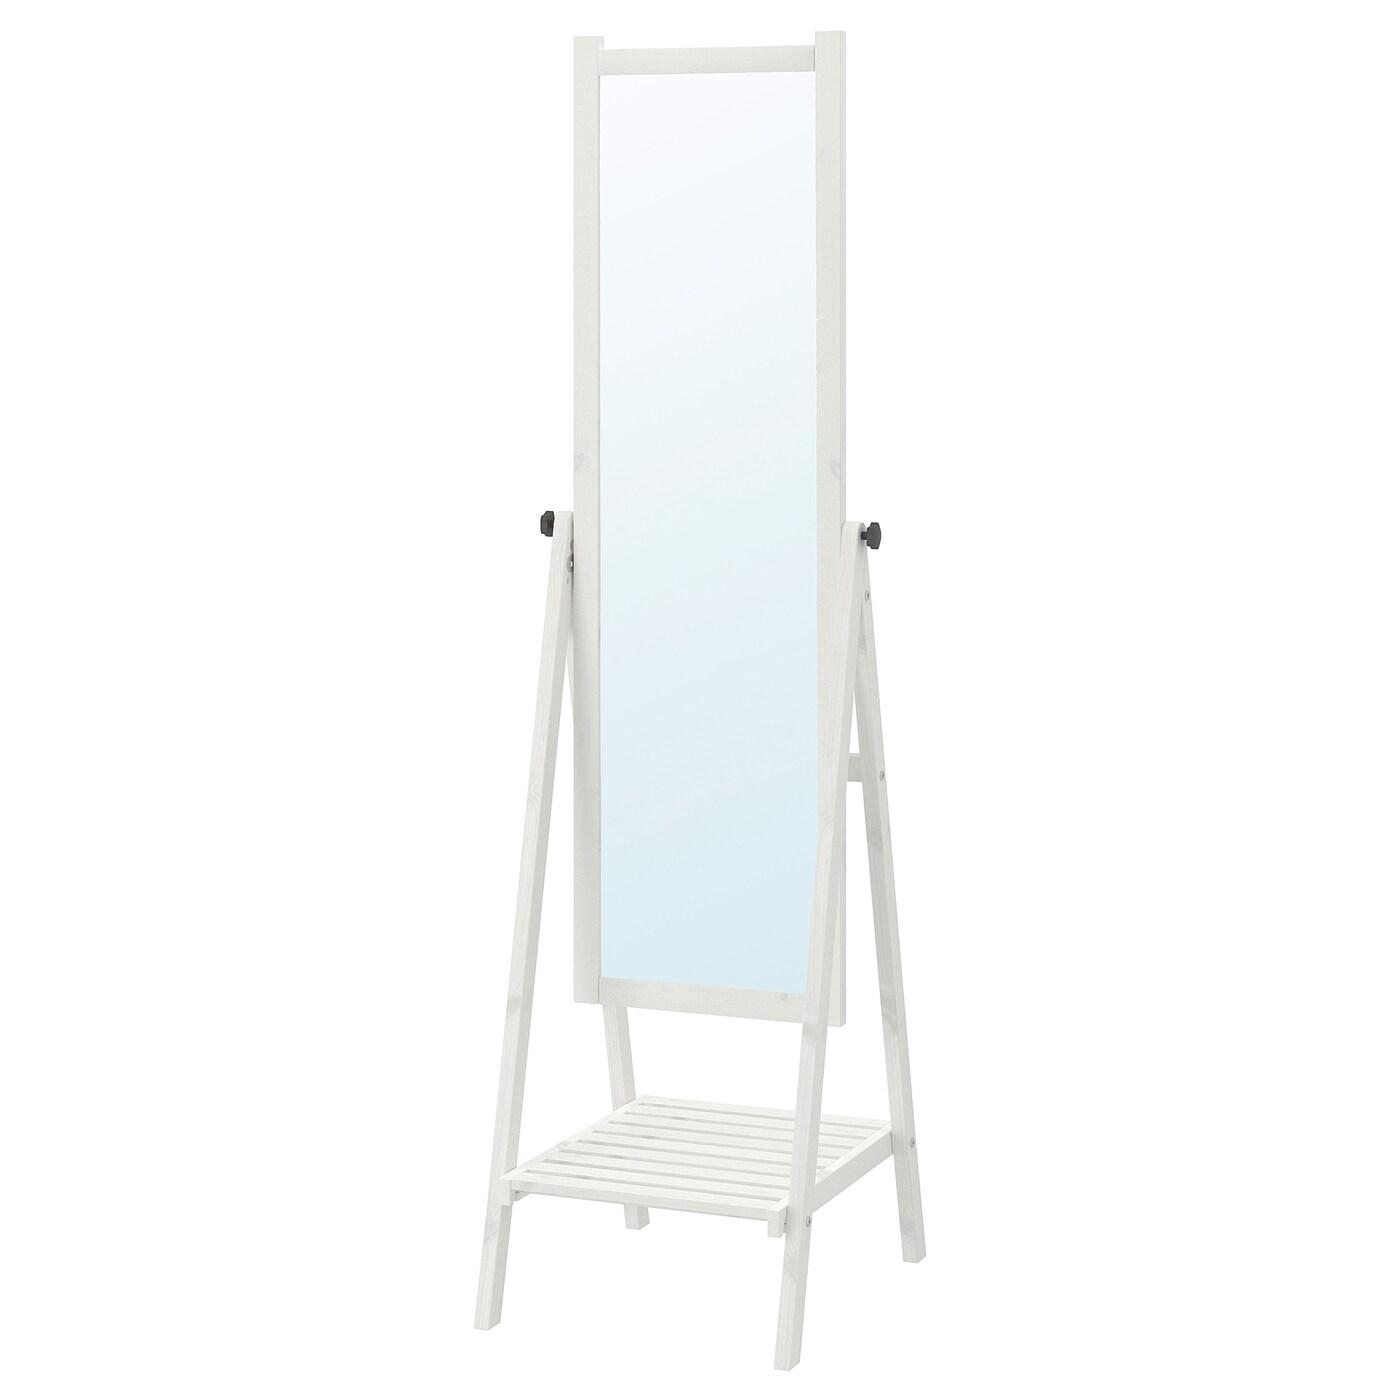 isfjorden miroir sur pied teint blanc 47 x 182 cm ikea. Black Bedroom Furniture Sets. Home Design Ideas